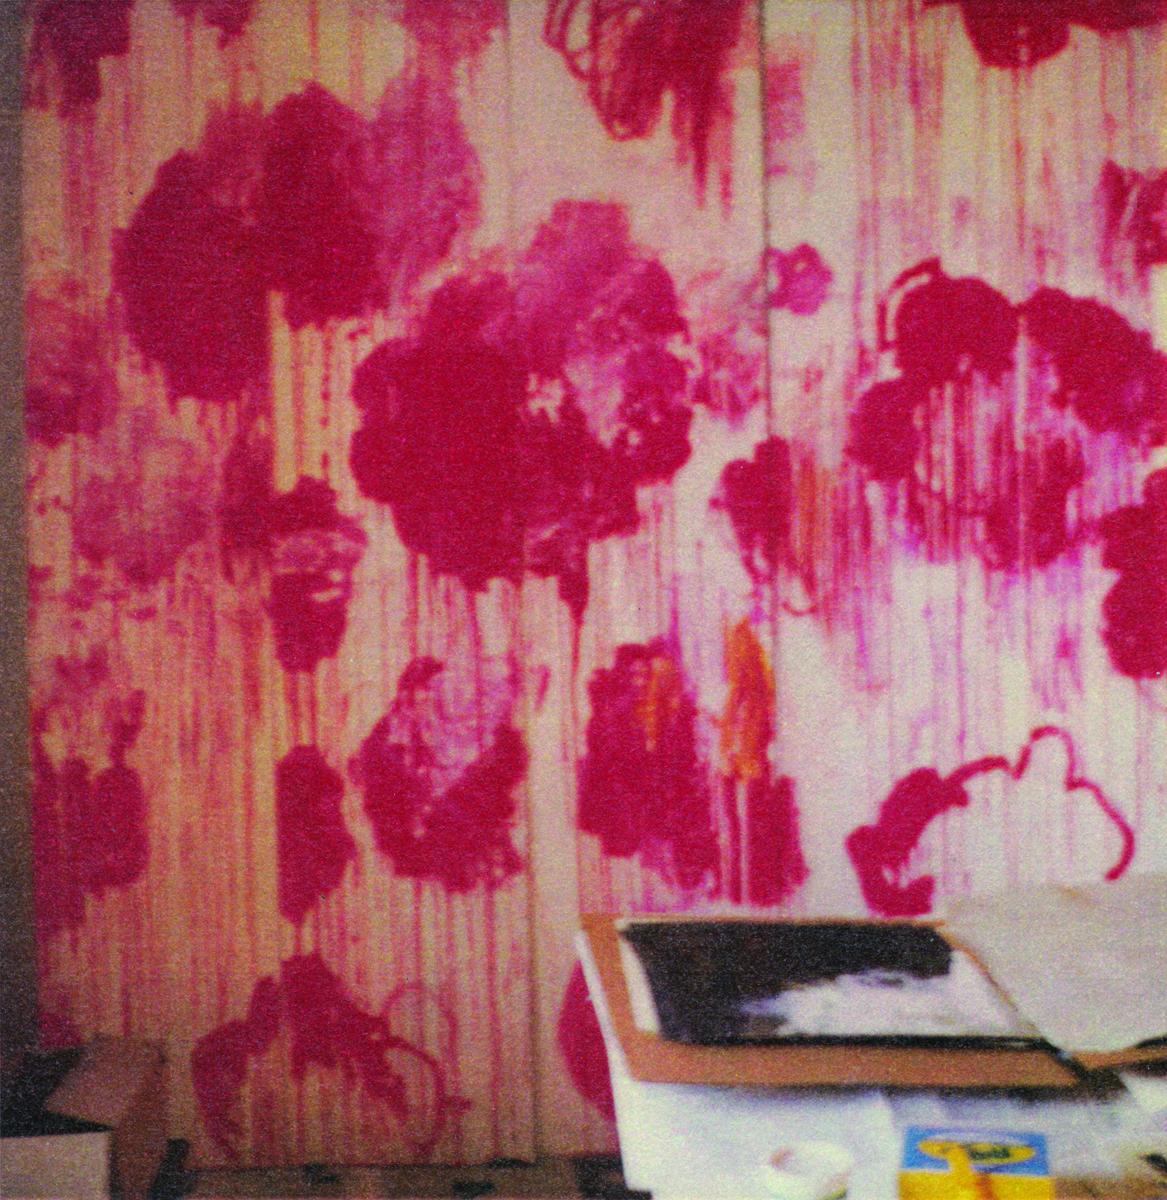 Cy Twombly, »Unfinished Painting« Gaeta 2006 / © 2016 Fondazione Nicola Del Roscio